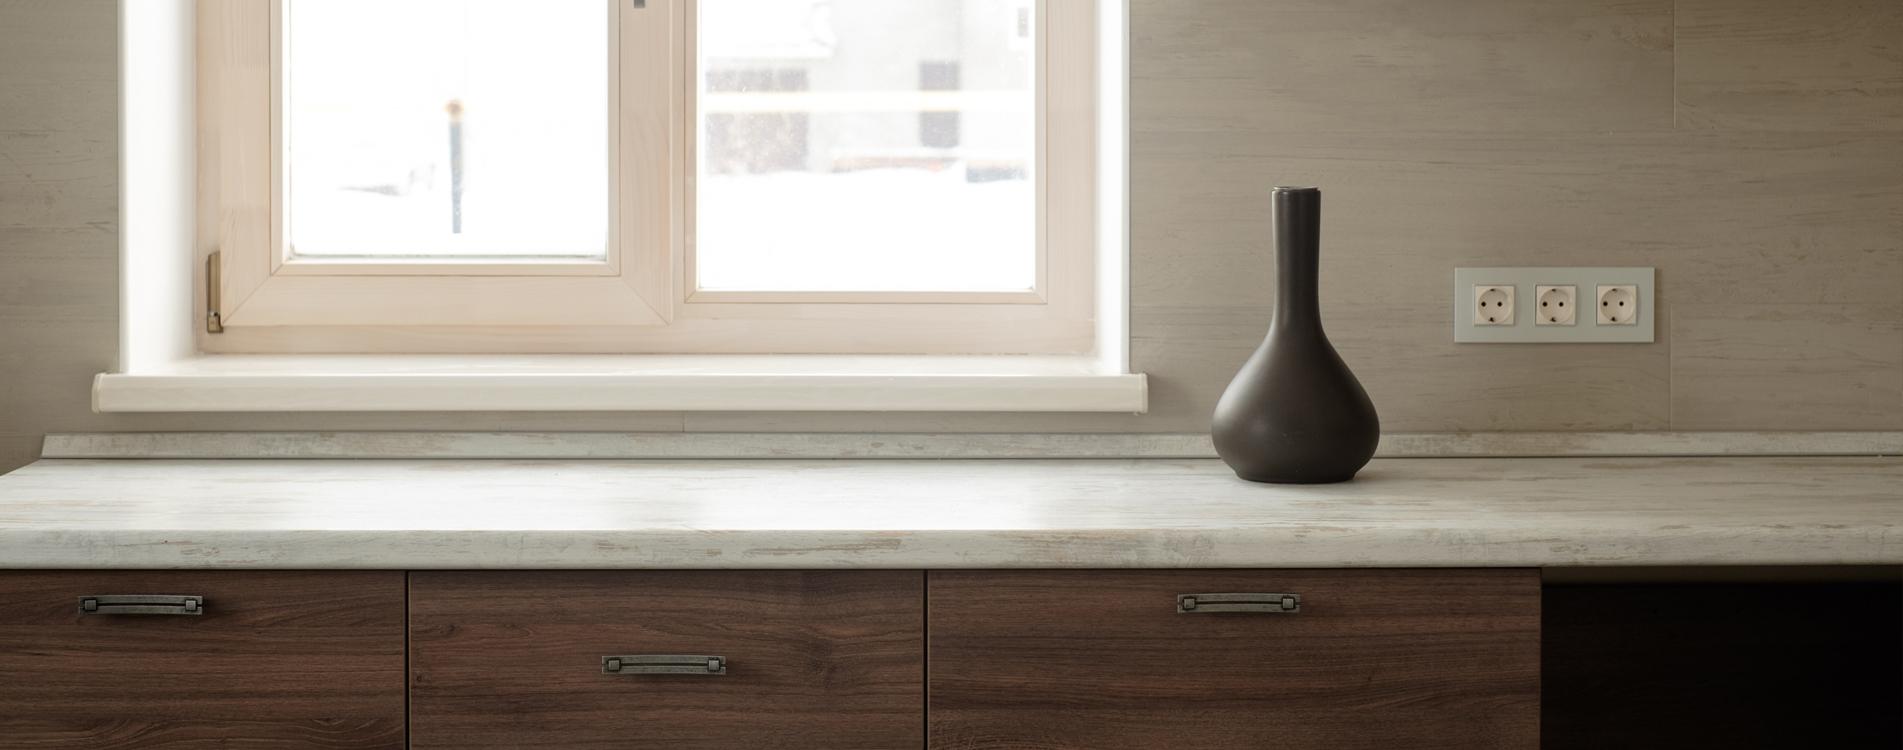 monier menuiserie votre artisan menuisier tournon sur rh ne valence. Black Bedroom Furniture Sets. Home Design Ideas